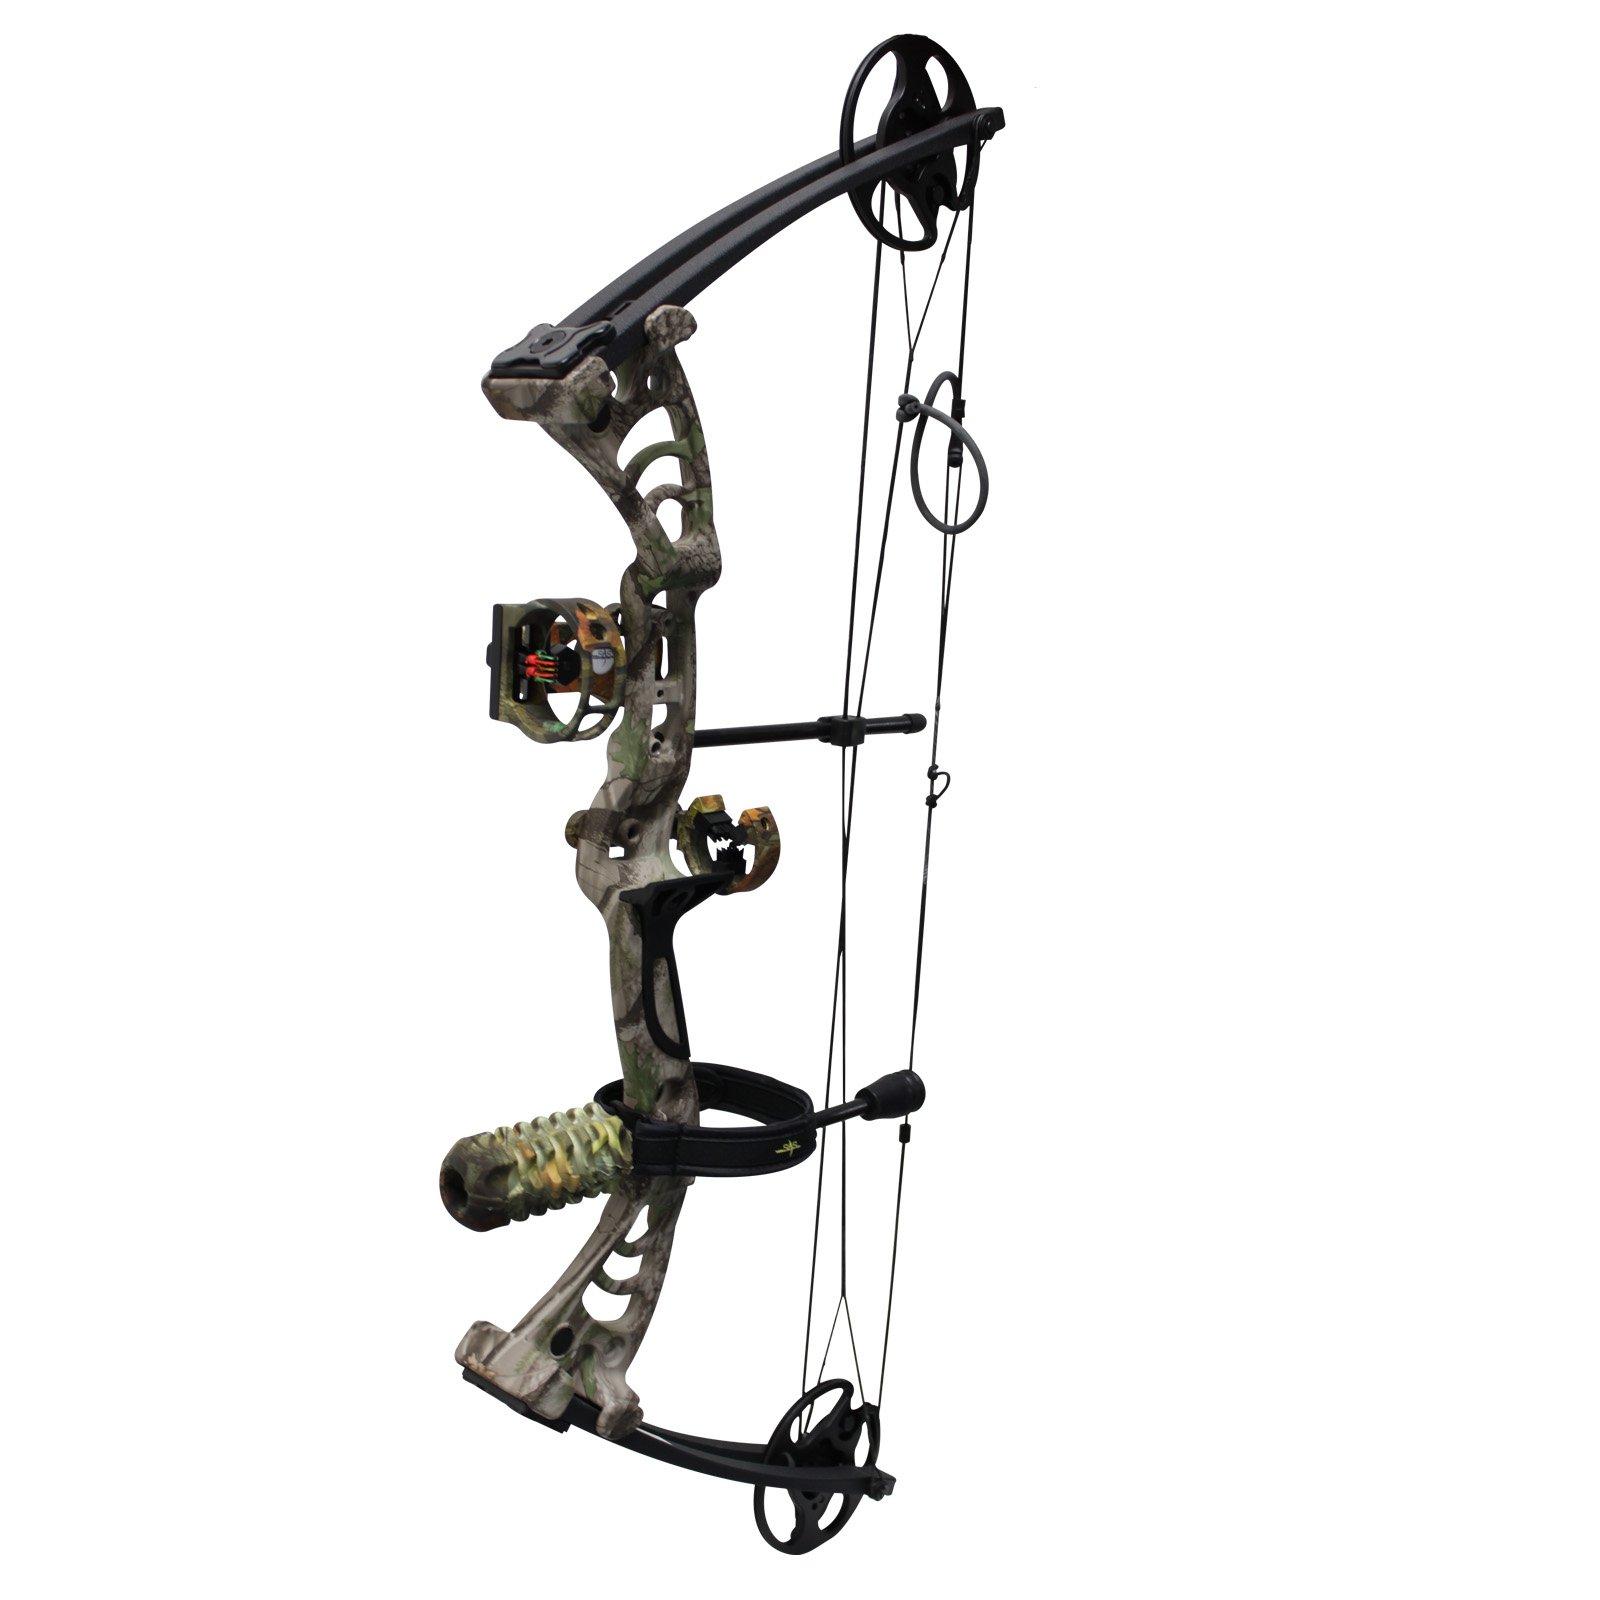 Southland Archery Supply SAS Scorpii 55 Lb 29'' Compound Bow (GC Camo w/Camo Accessories Kit)